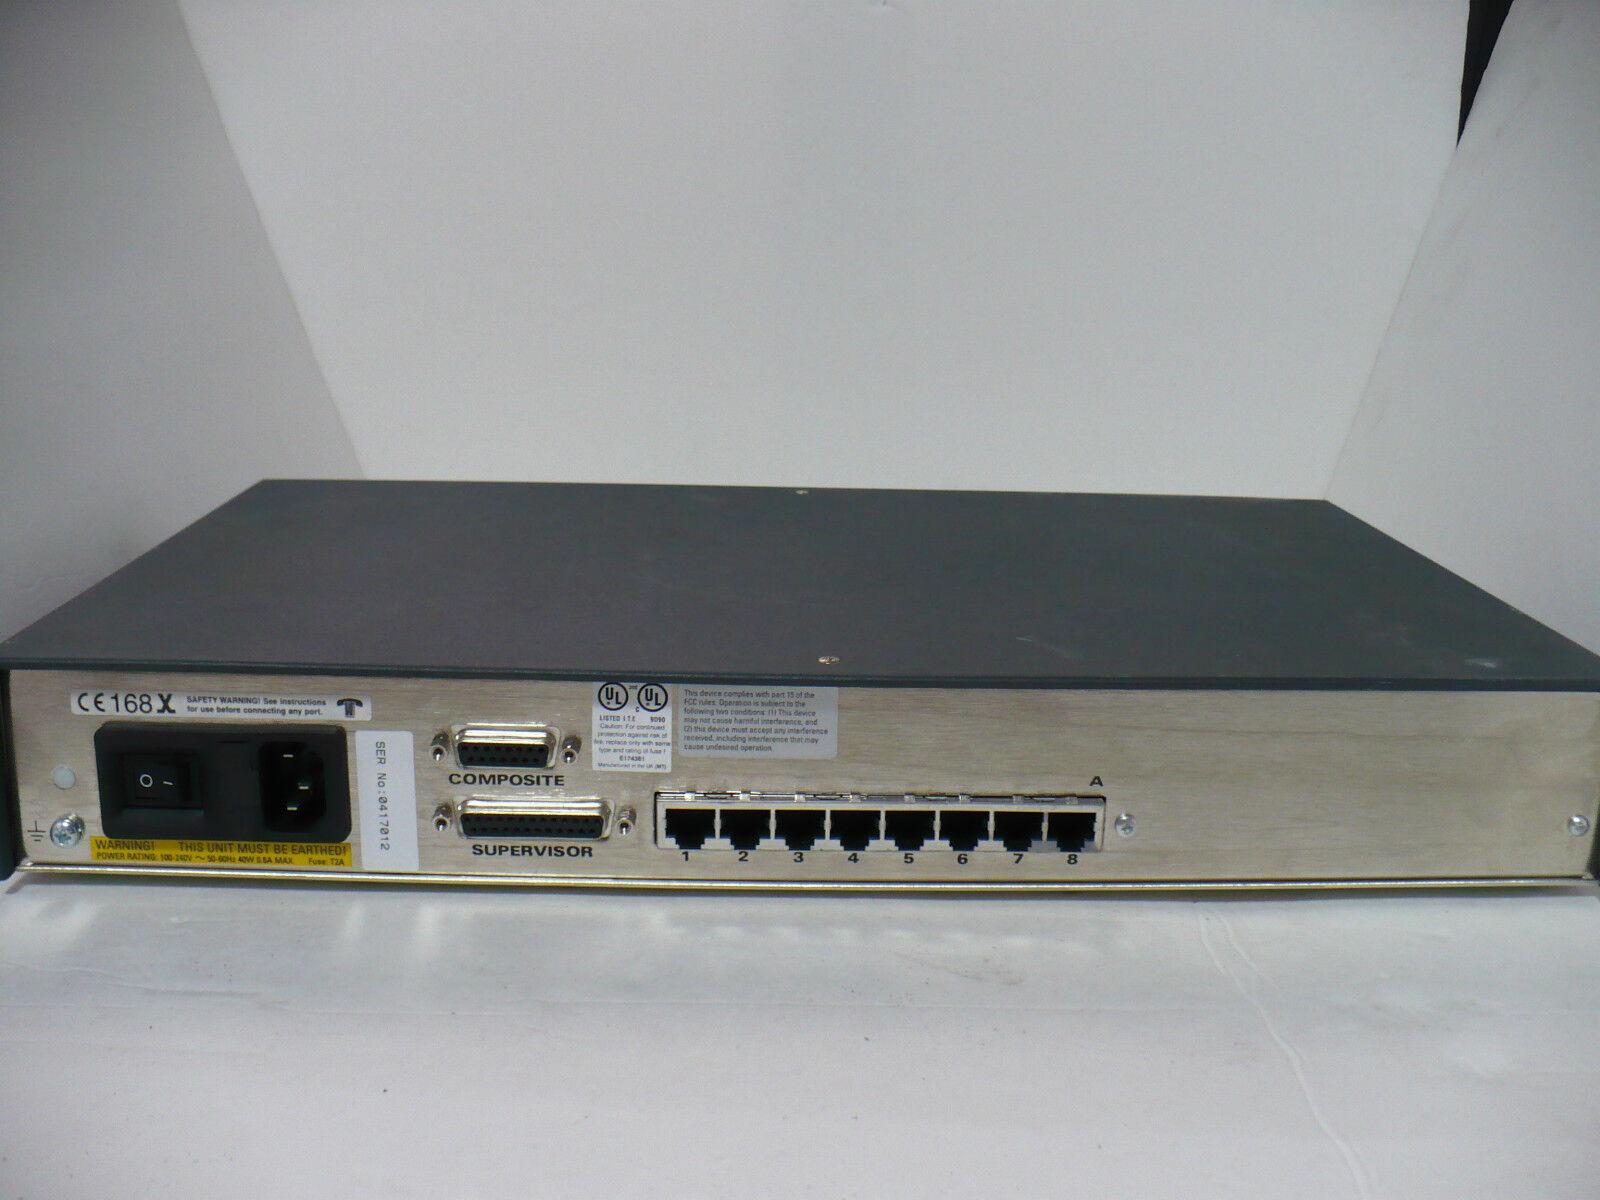 100 Fairchild MM74HC251MX 8-Channel 3-St.Multiplexer IC